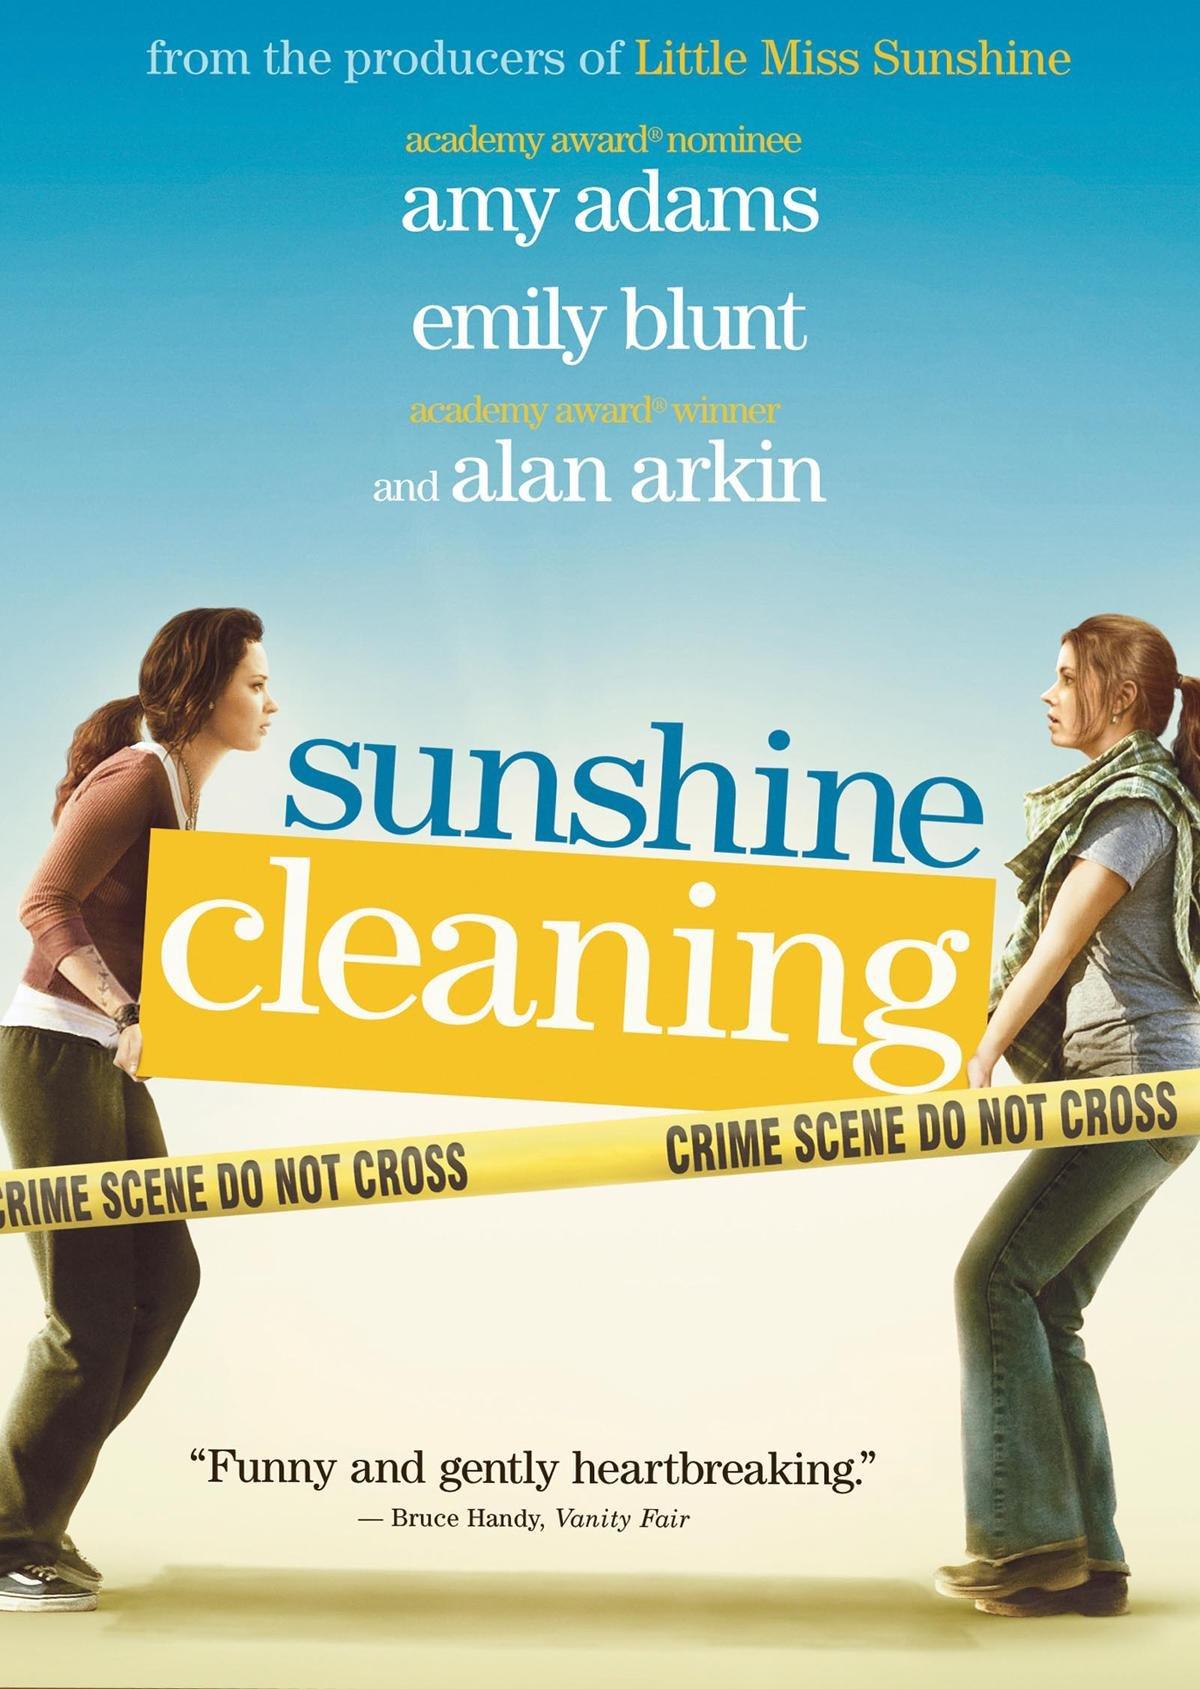 Amazon.com: Sunshine Cleaning: Amy Adams, Emily Blunt, Alan Arkin ...